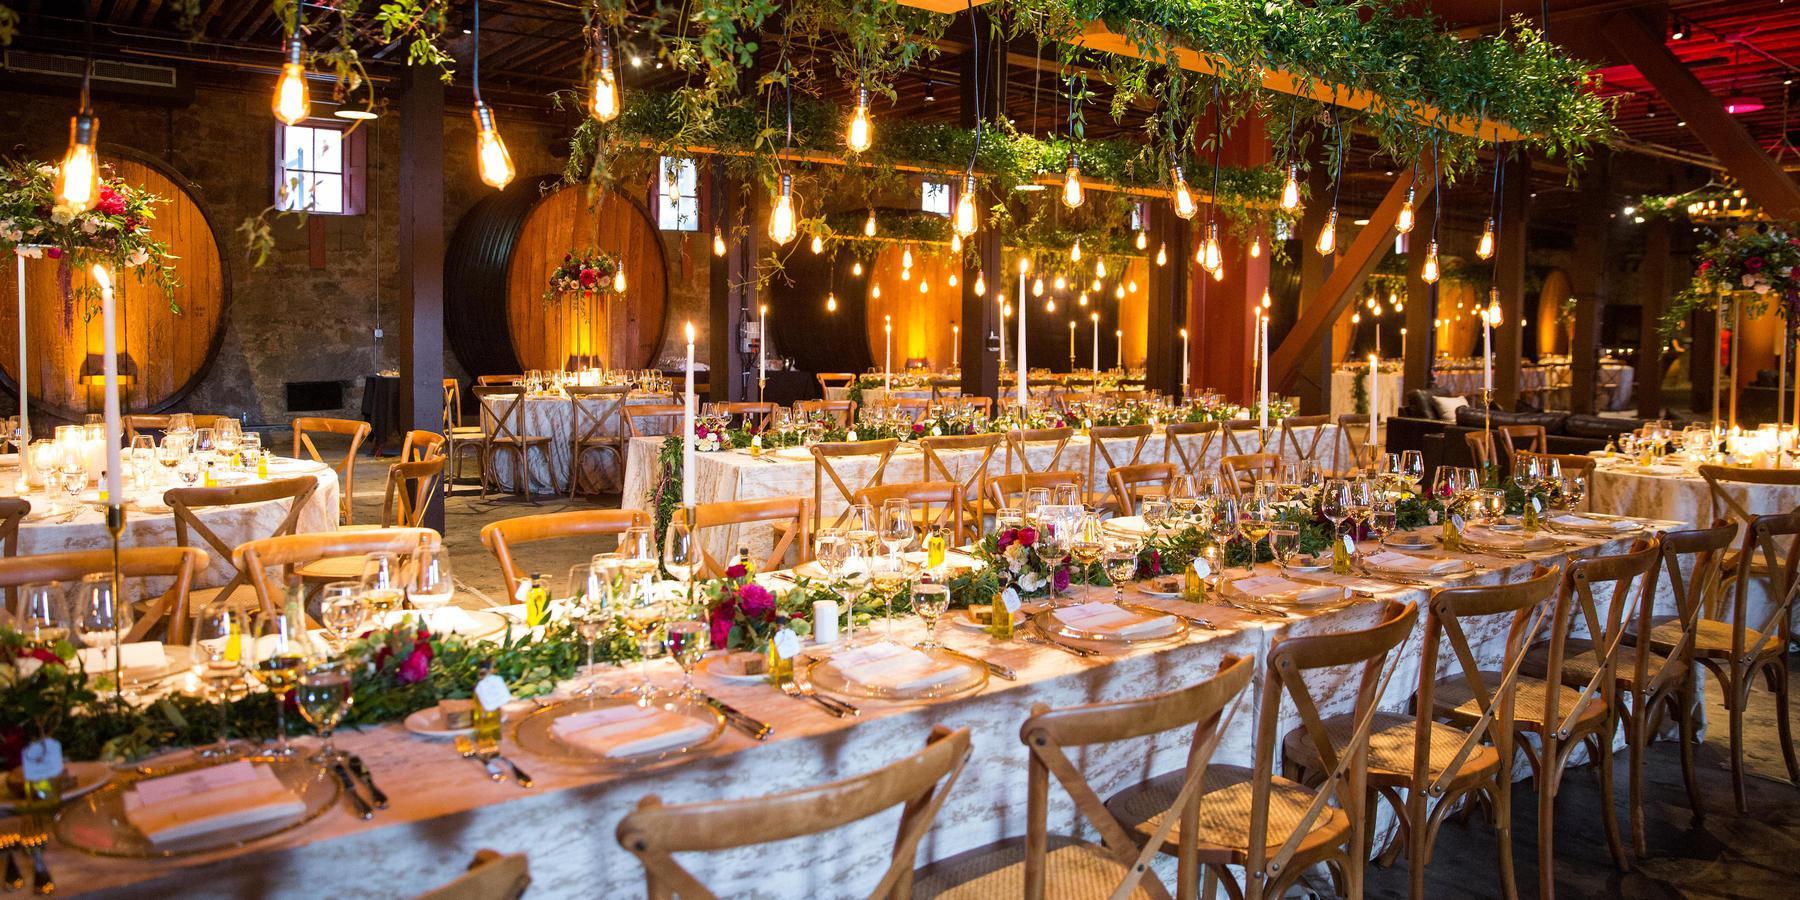 Culinary Institute Of America New York >> The Culinary Institute Of America Weddings Get Prices For